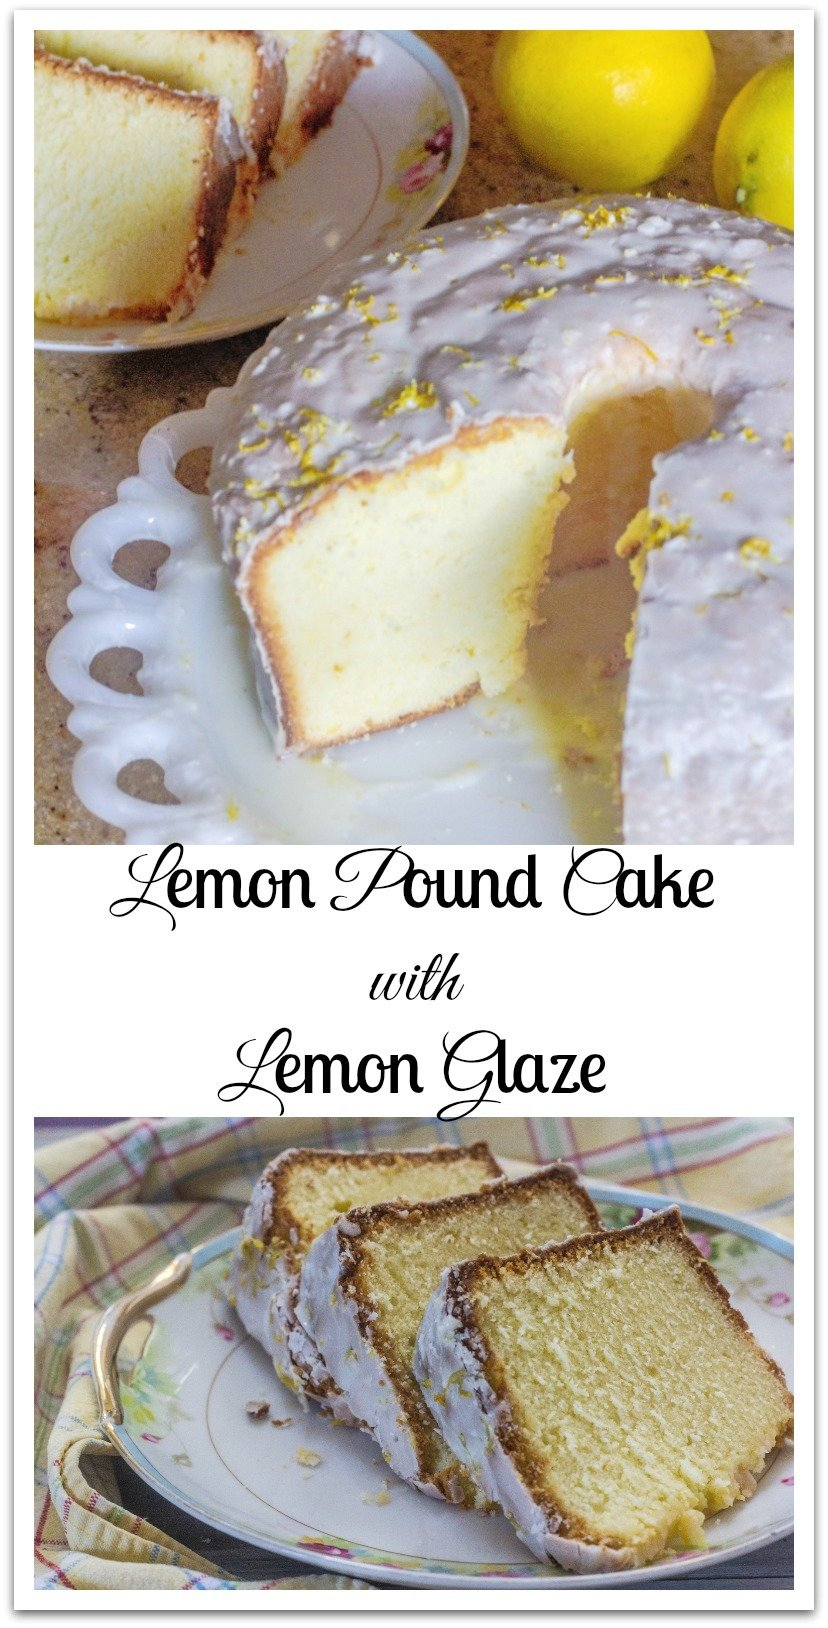 "This Lemon Pound Cake with Lemon Glazedidn't disappoint. It is lemony andlusciousand moist. Very ""lemon-drop"" like in taste. #LemonCake #LemonGlaze"